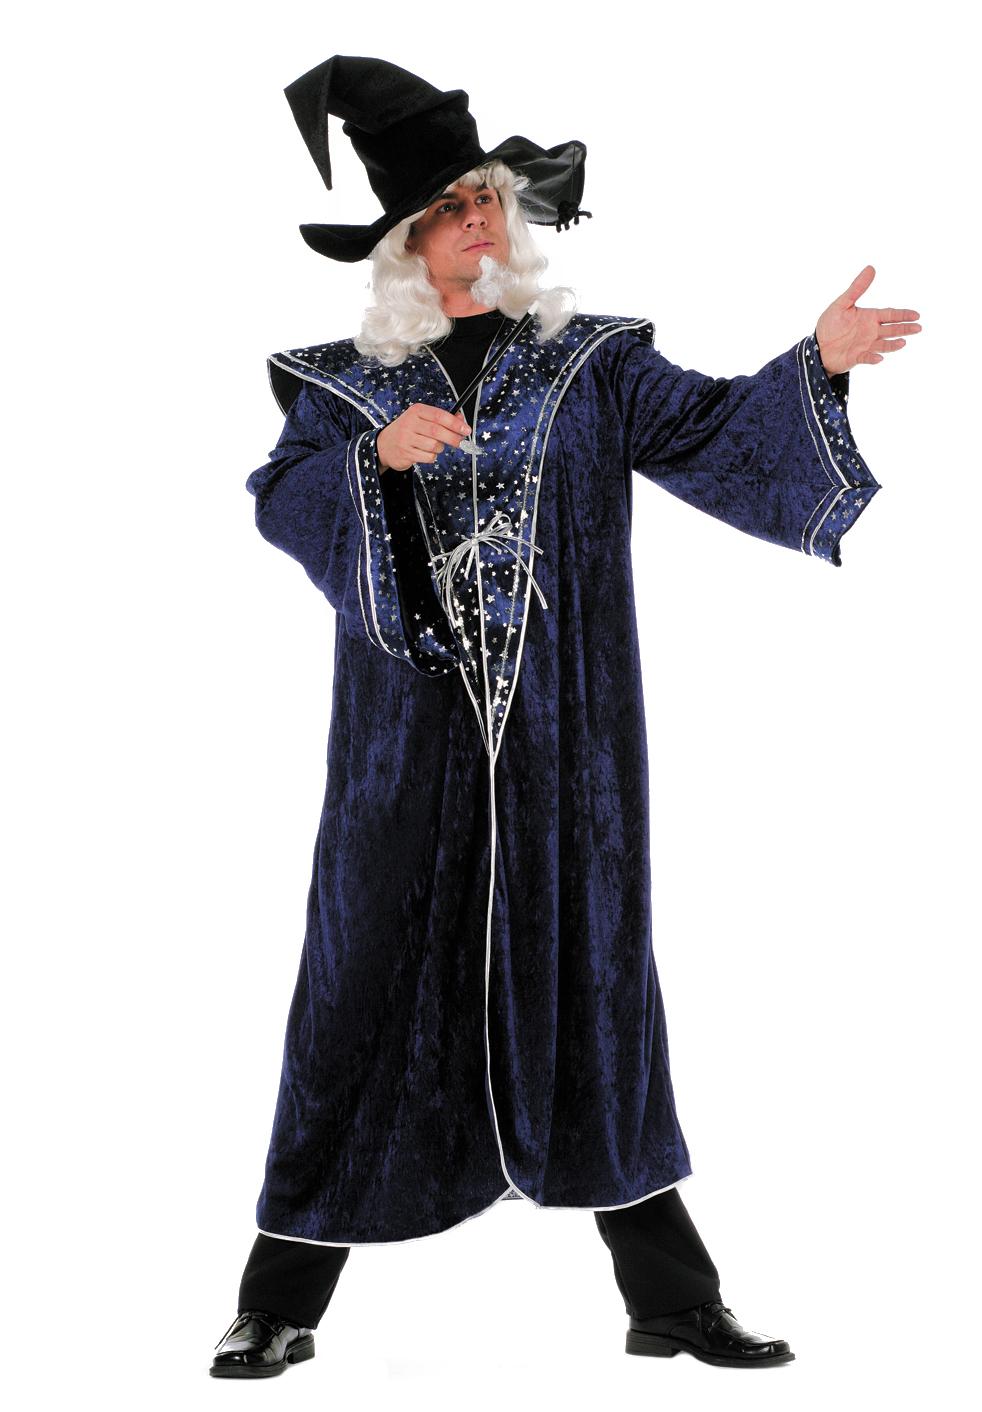 Indexbild 4 - Wilbers Kostüm Zauberer 50 - 60 blaue Sterne Zaubermeister